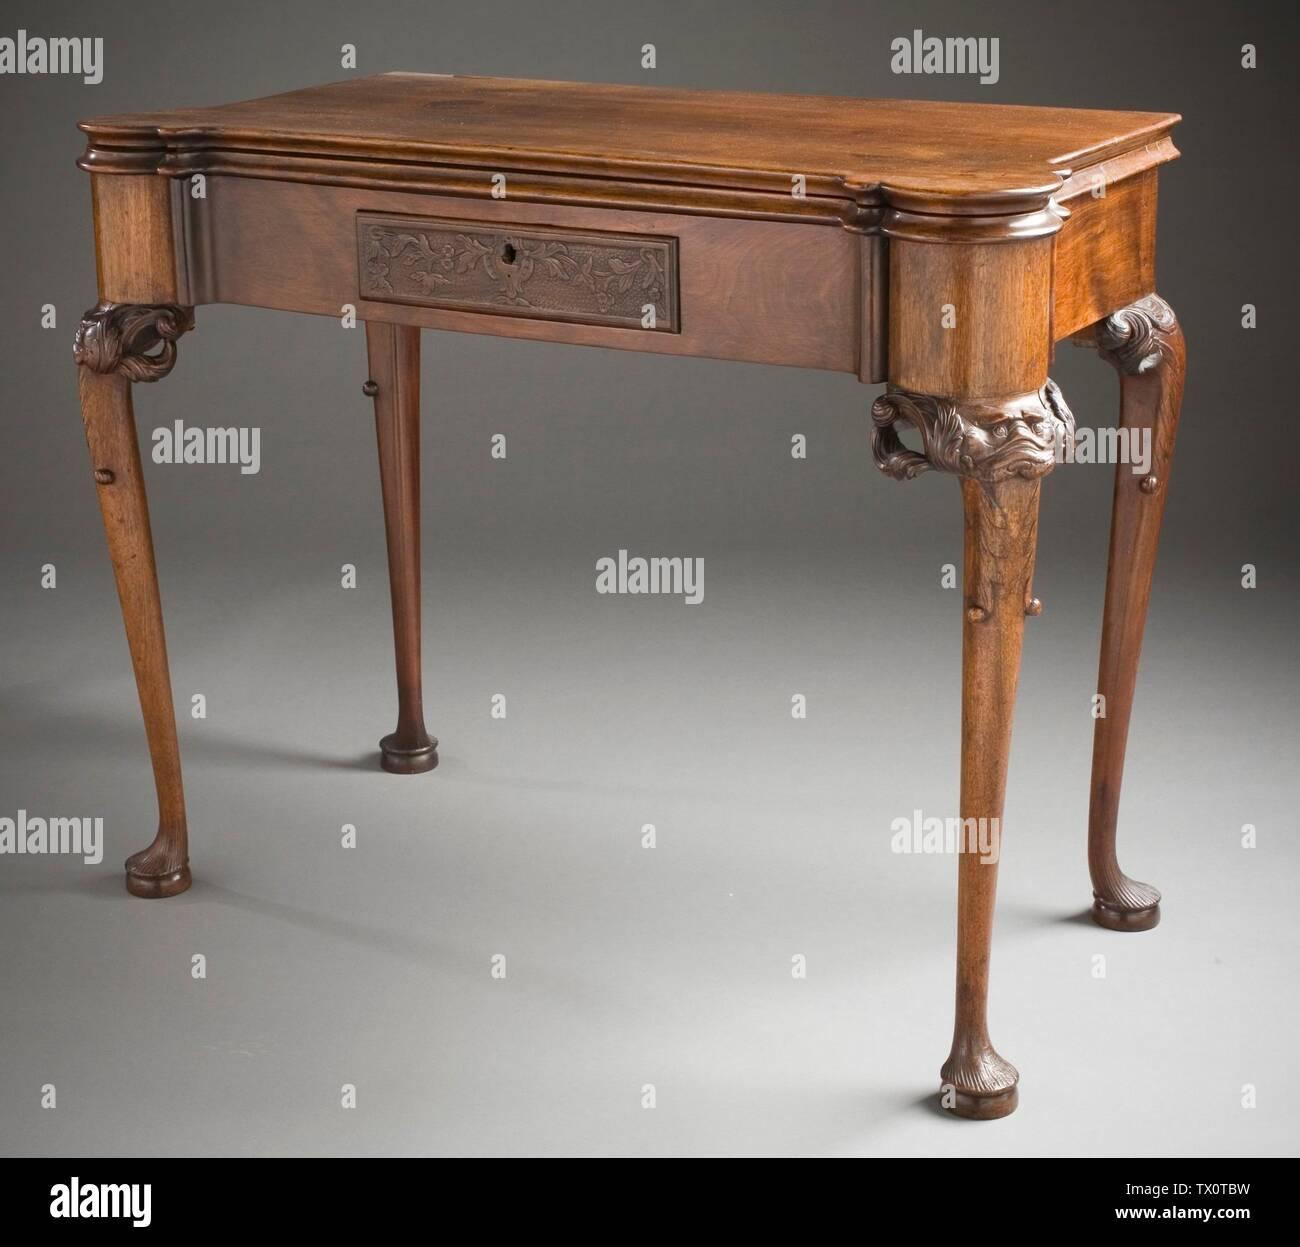 'Tarjeta de mesa con Mask-Carved rodillas (Imagen 1 de 4); en inglés: Estados Unidos, Massachusetts, Boston, circa 1750; muebles muebles de nogal, pinares con forro de tapete verde original 28 1/4 x 37 1/8 x 25 1/2 pulg. (71,76 x 94,30 x 64,77 cm) de regalo de la Sra. Murray Braunfeld (M.2006.51.2) Artes Decorativas y diseño; circa 1750 fecha QS:P571,+1750-00-00T00:00:00Z/9,P1480,Q5727902; ' Imagen De Stock